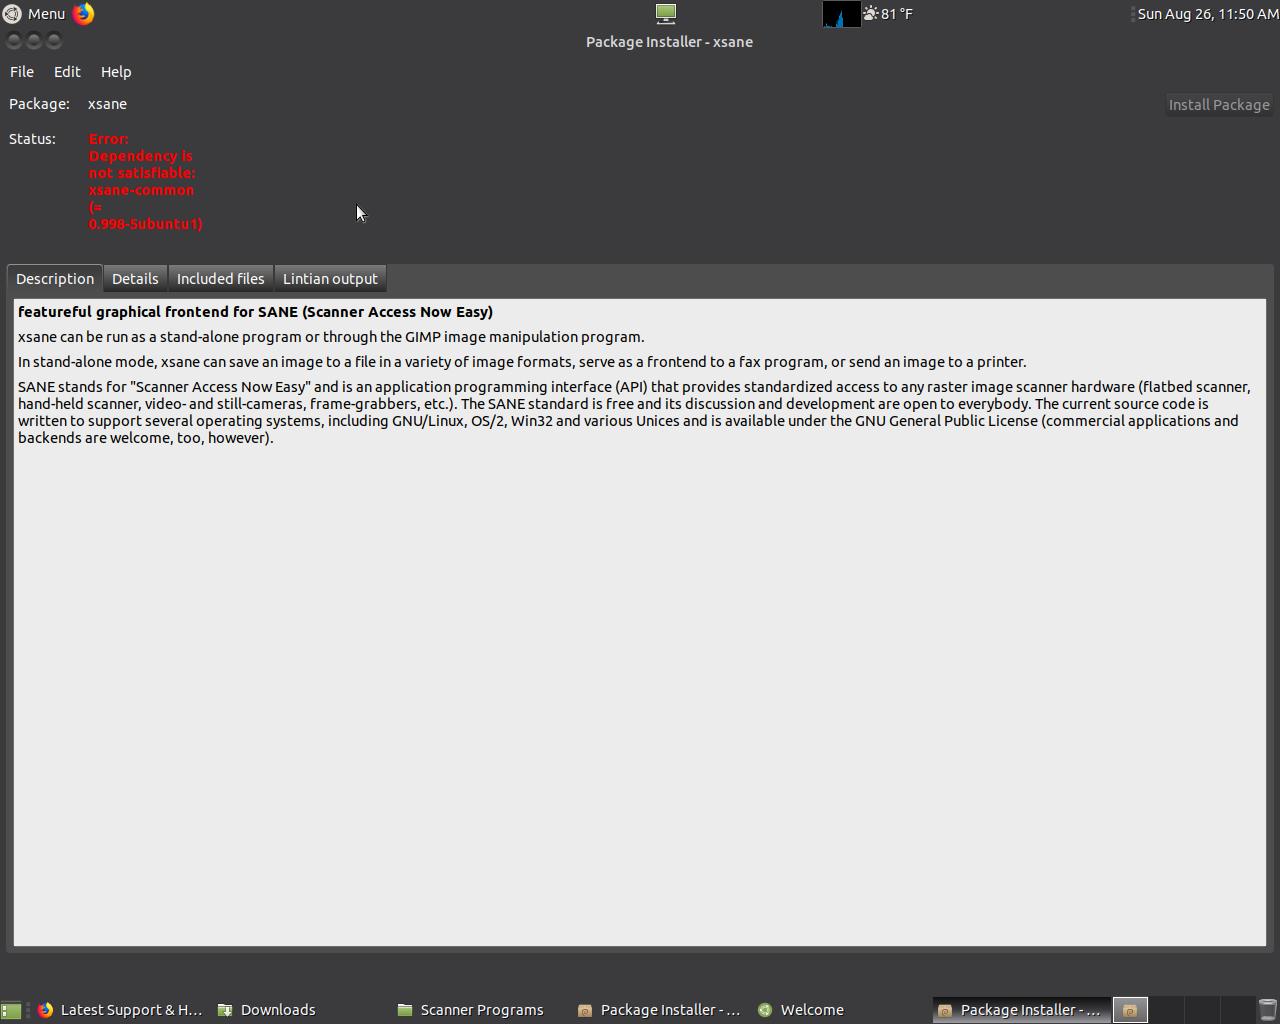 XSANE install problem - Support & Help Requests - Ubuntu